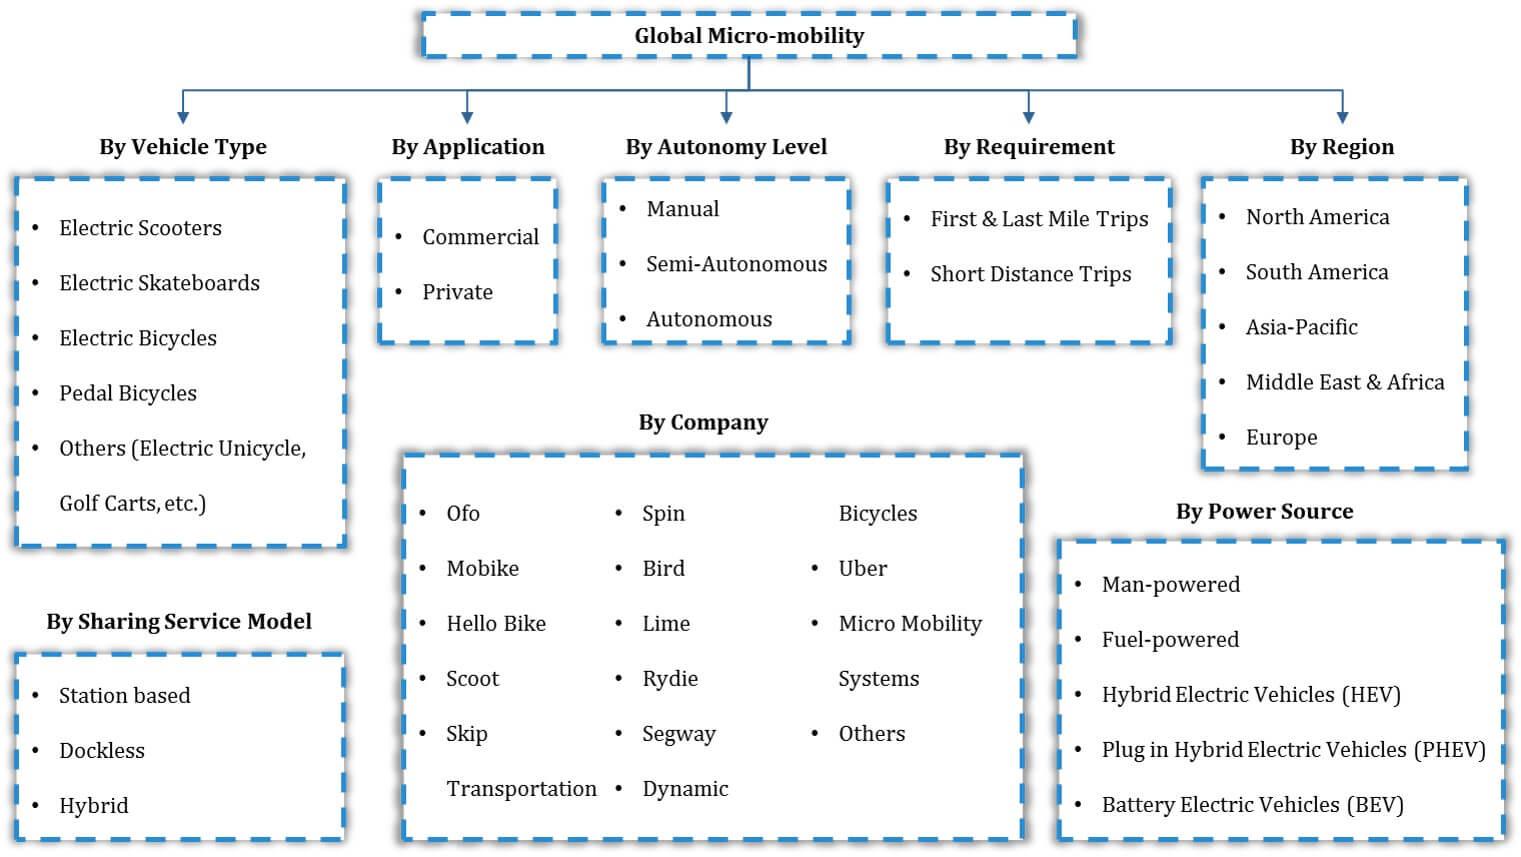 Global Micromobility Market Segmentation